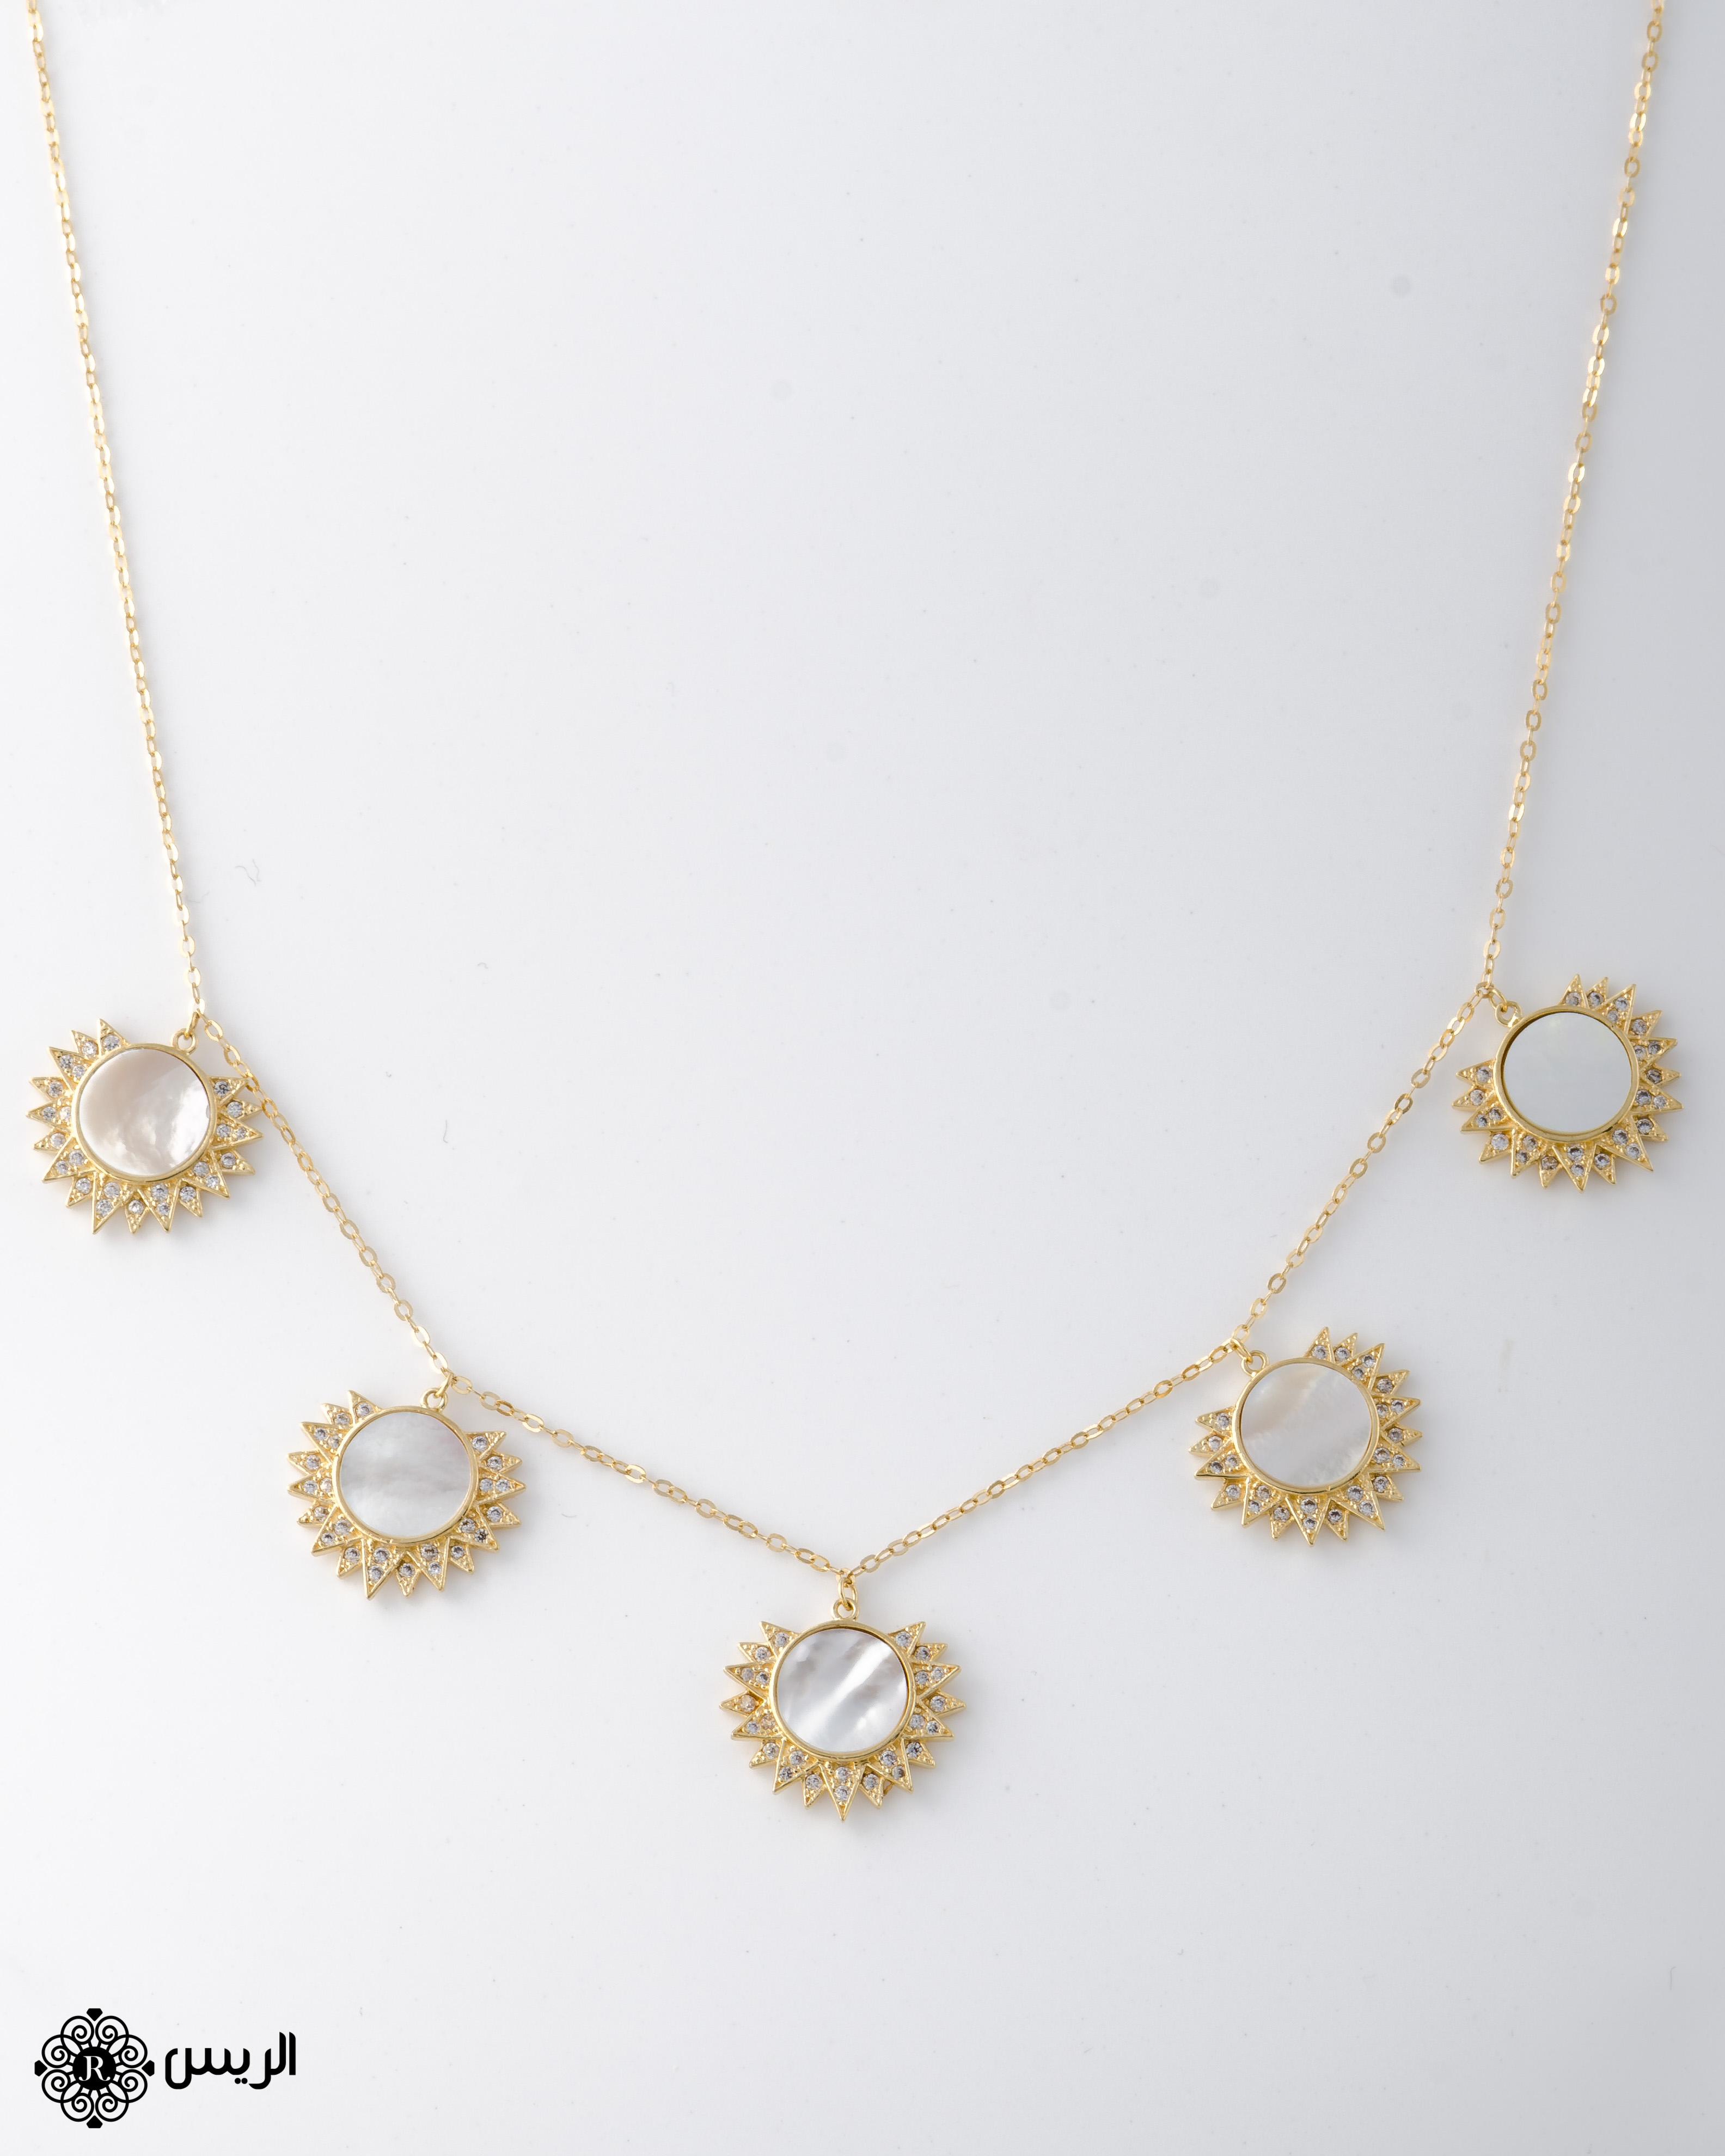 Raies jewelry Choker Necklace عقد تشوكر الريس للمجوهرات